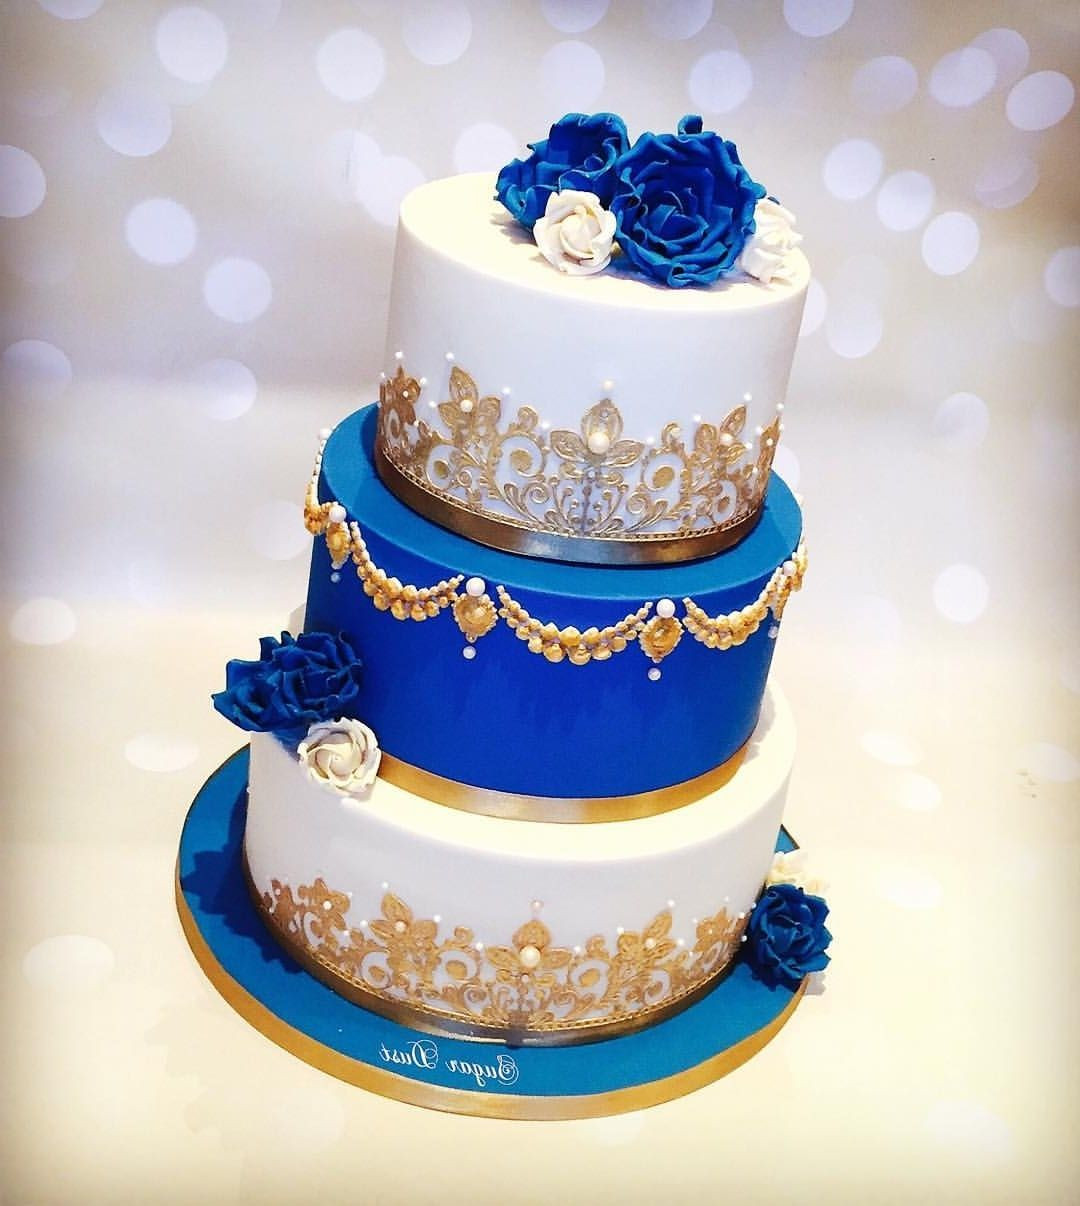 Royal Blue And Gold Wedding Cakes  Wedding Cakes Royal Blue And Gold